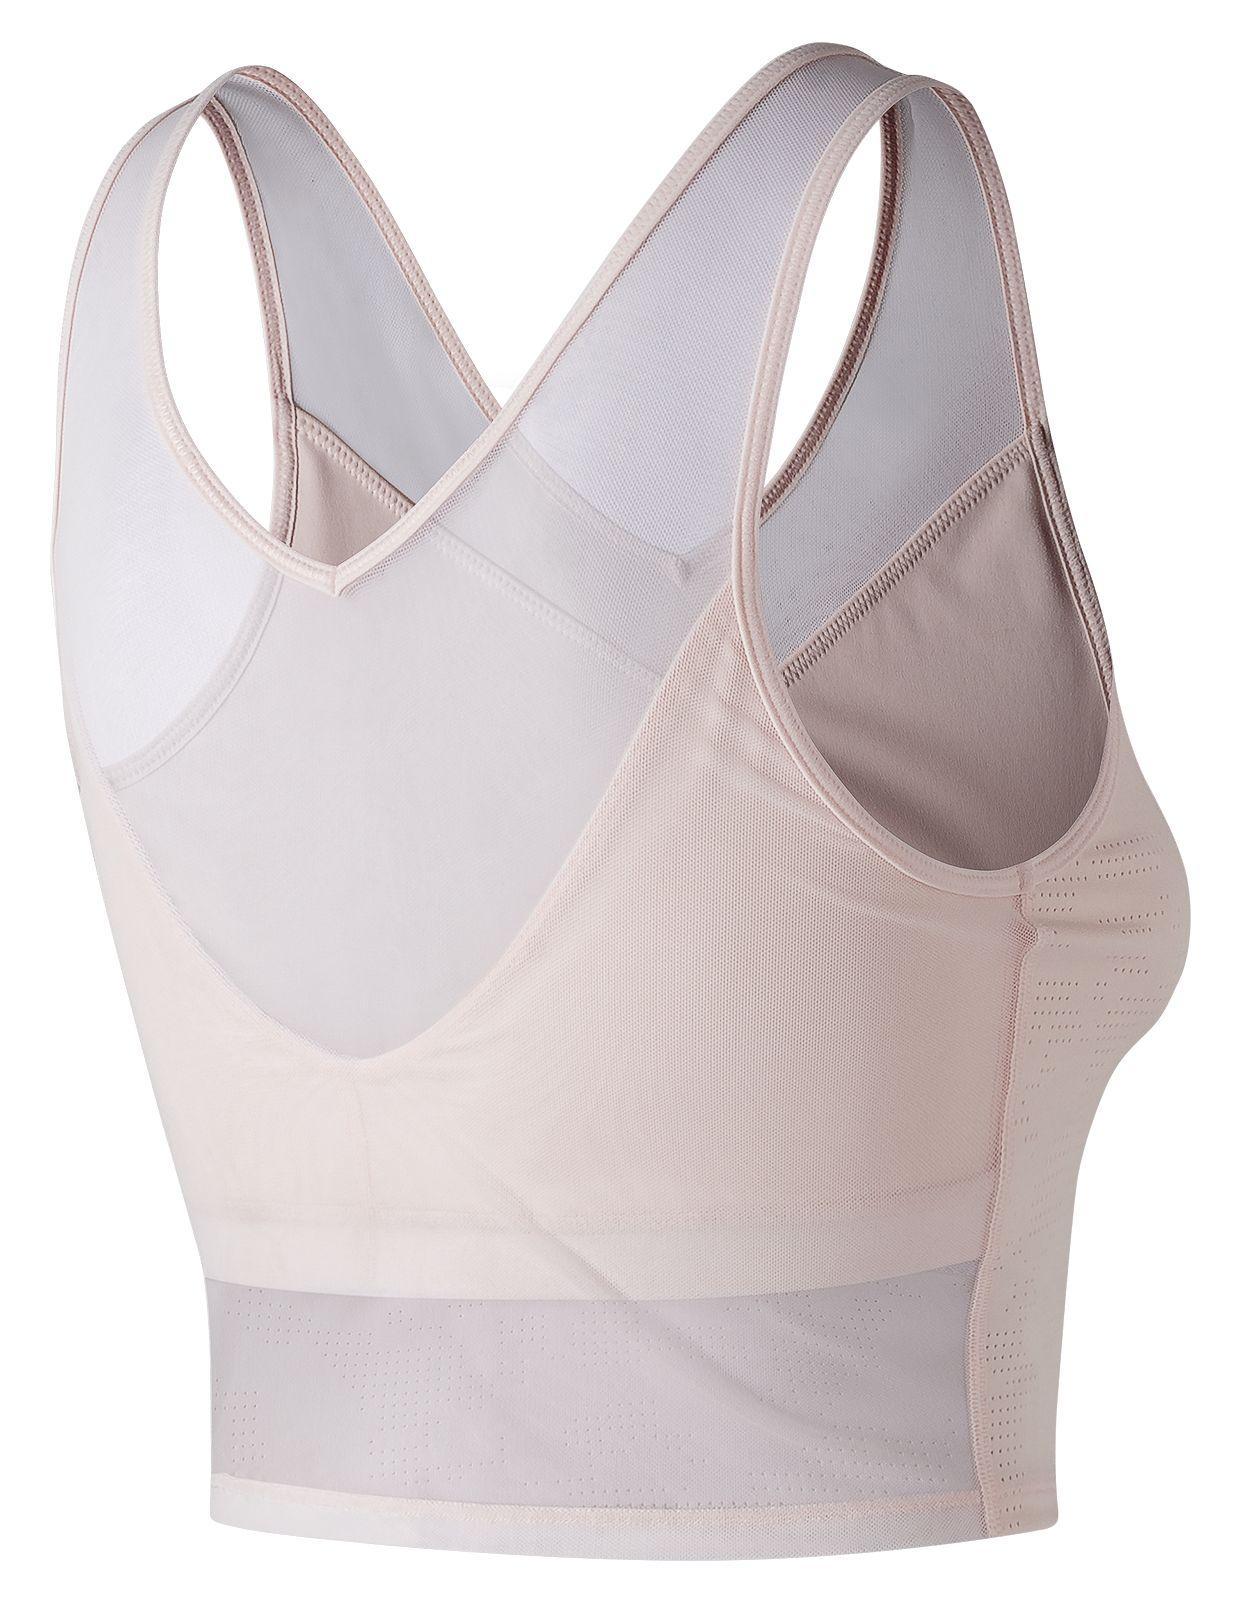 a10ff7cea4f83 New Balance Pink Feel The Cool Lace Crop Bra. View fullscreen